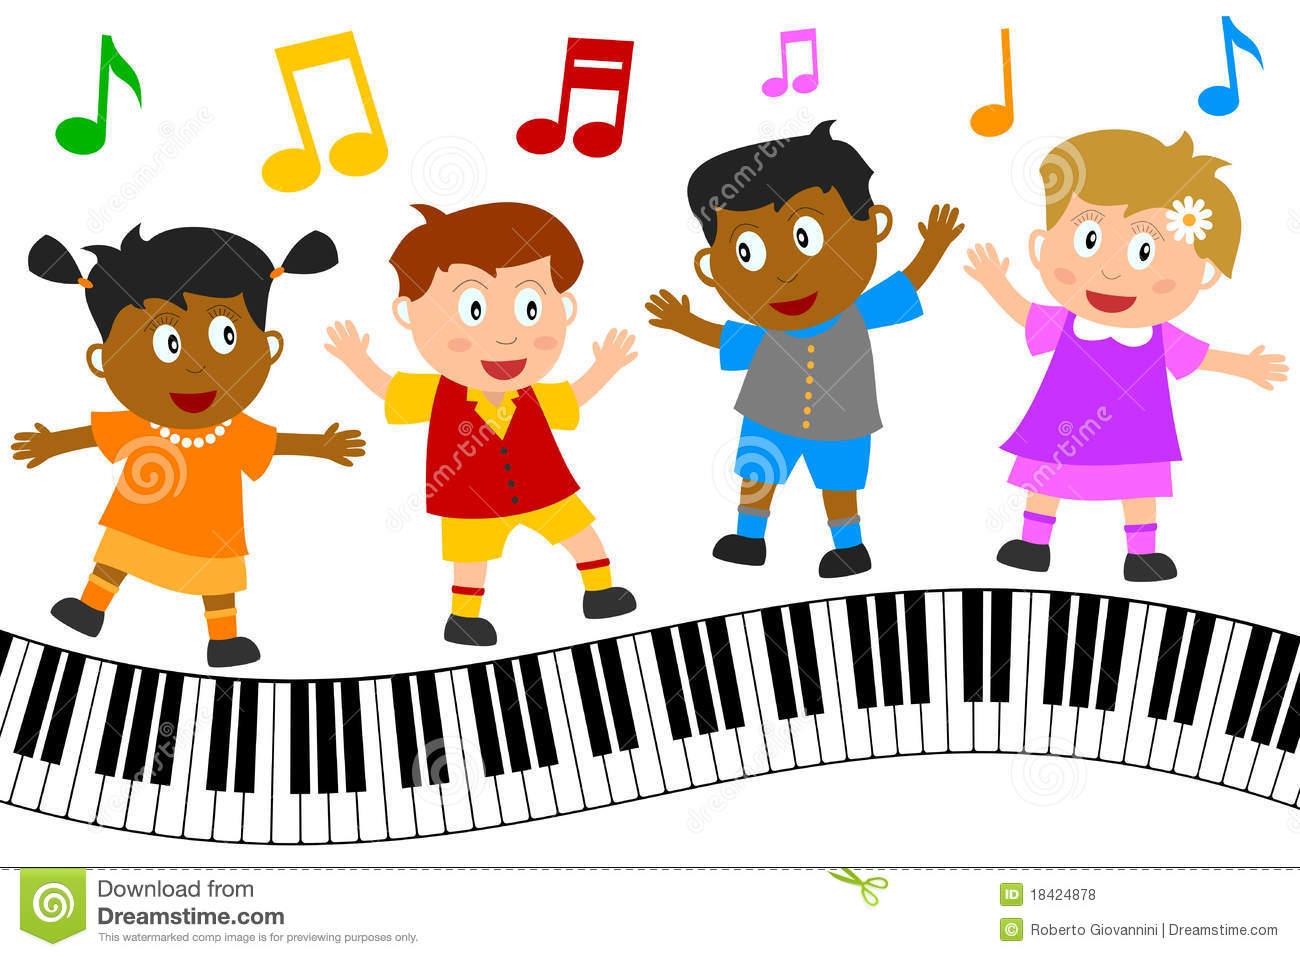 music clip art for kids clipart panda free clipart images rh clipartpanda com Music Therapy Clip Art Music Symbols Clip Art